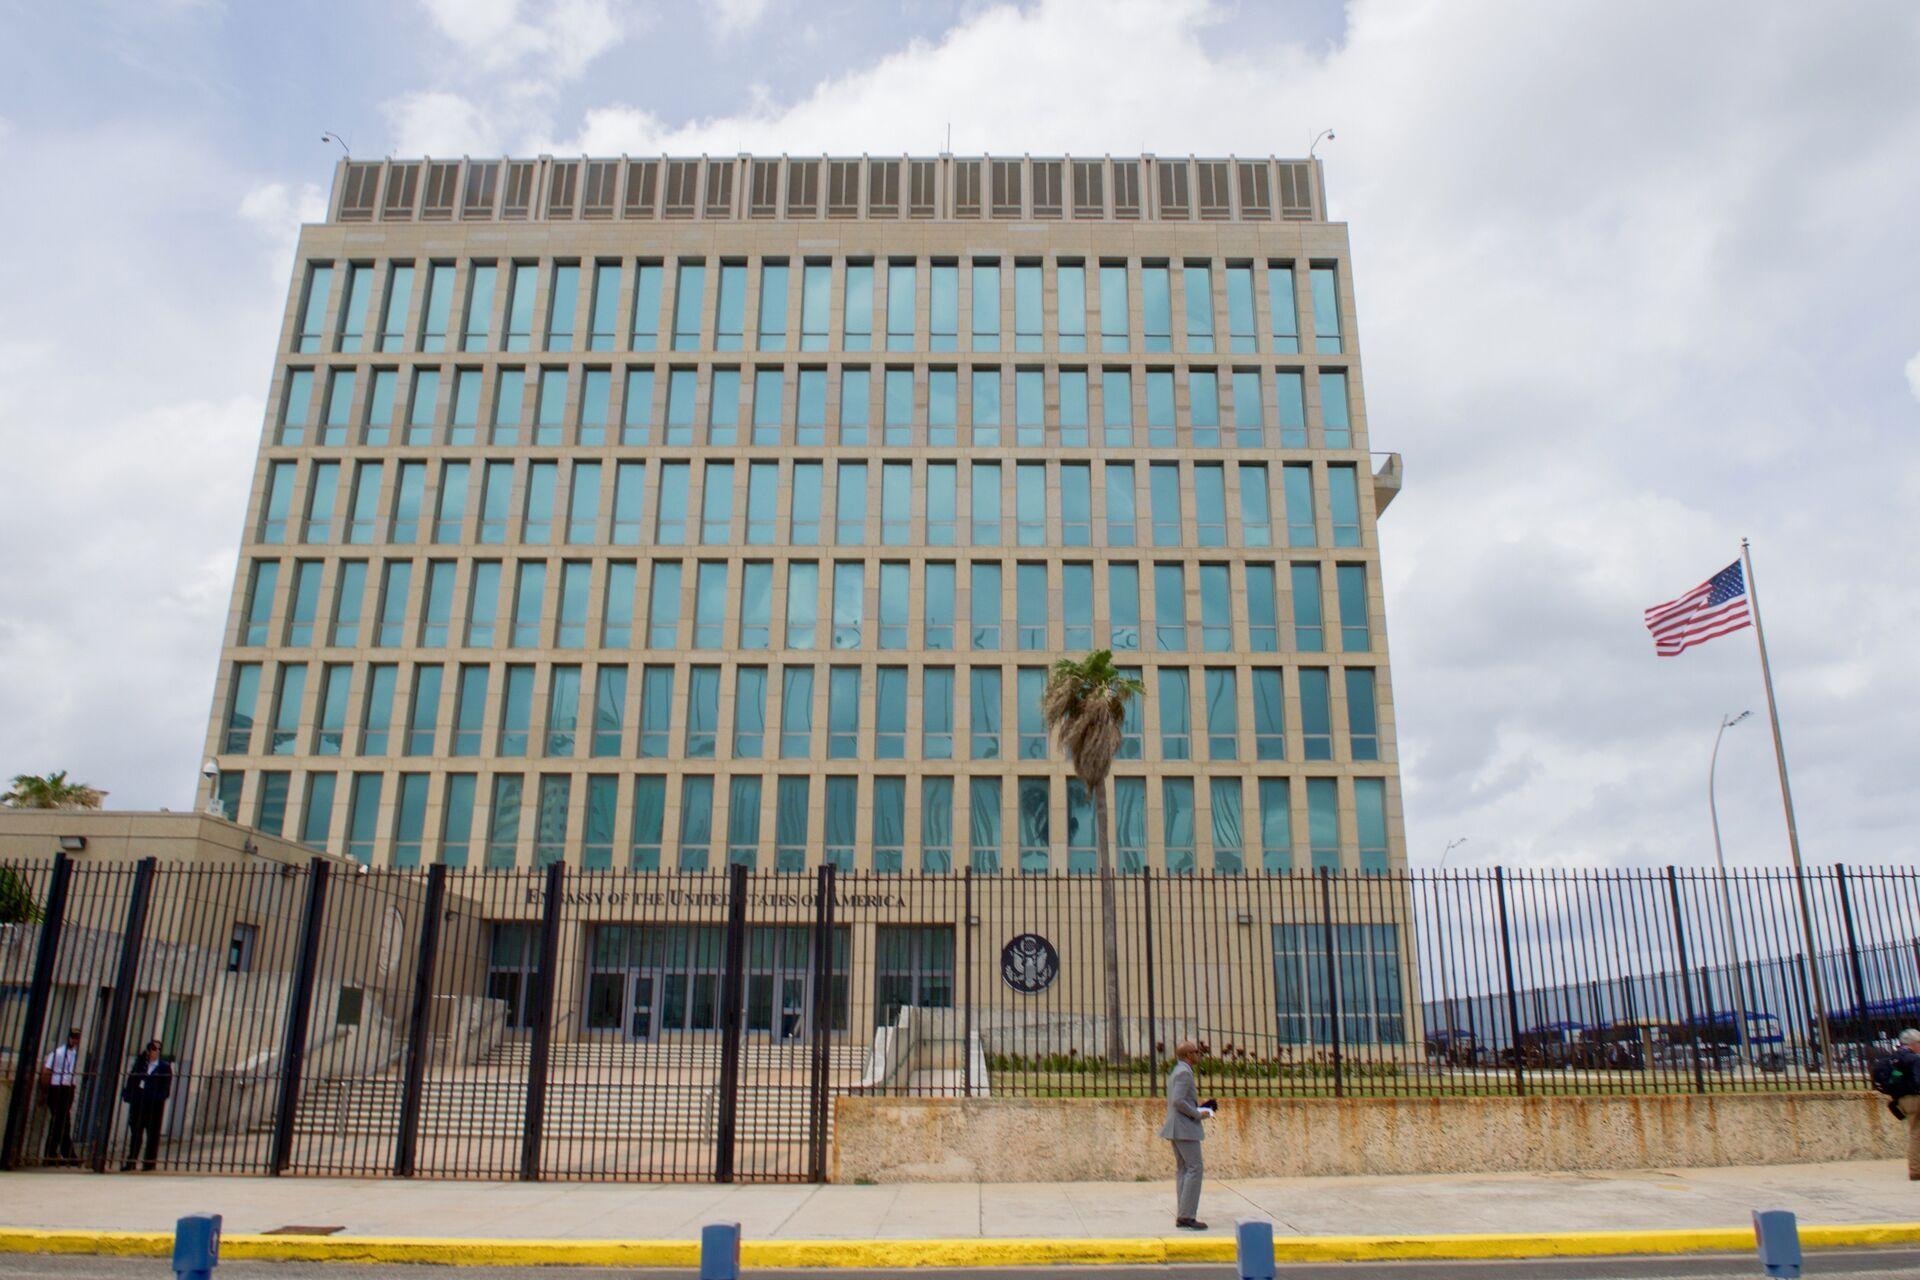 The U.S. flag flaps in the stiff breeze off the Florida Straits at the U.S. Embassy in Havana, Cuba. (File) - Sputnik International, 1920, 14.09.2021